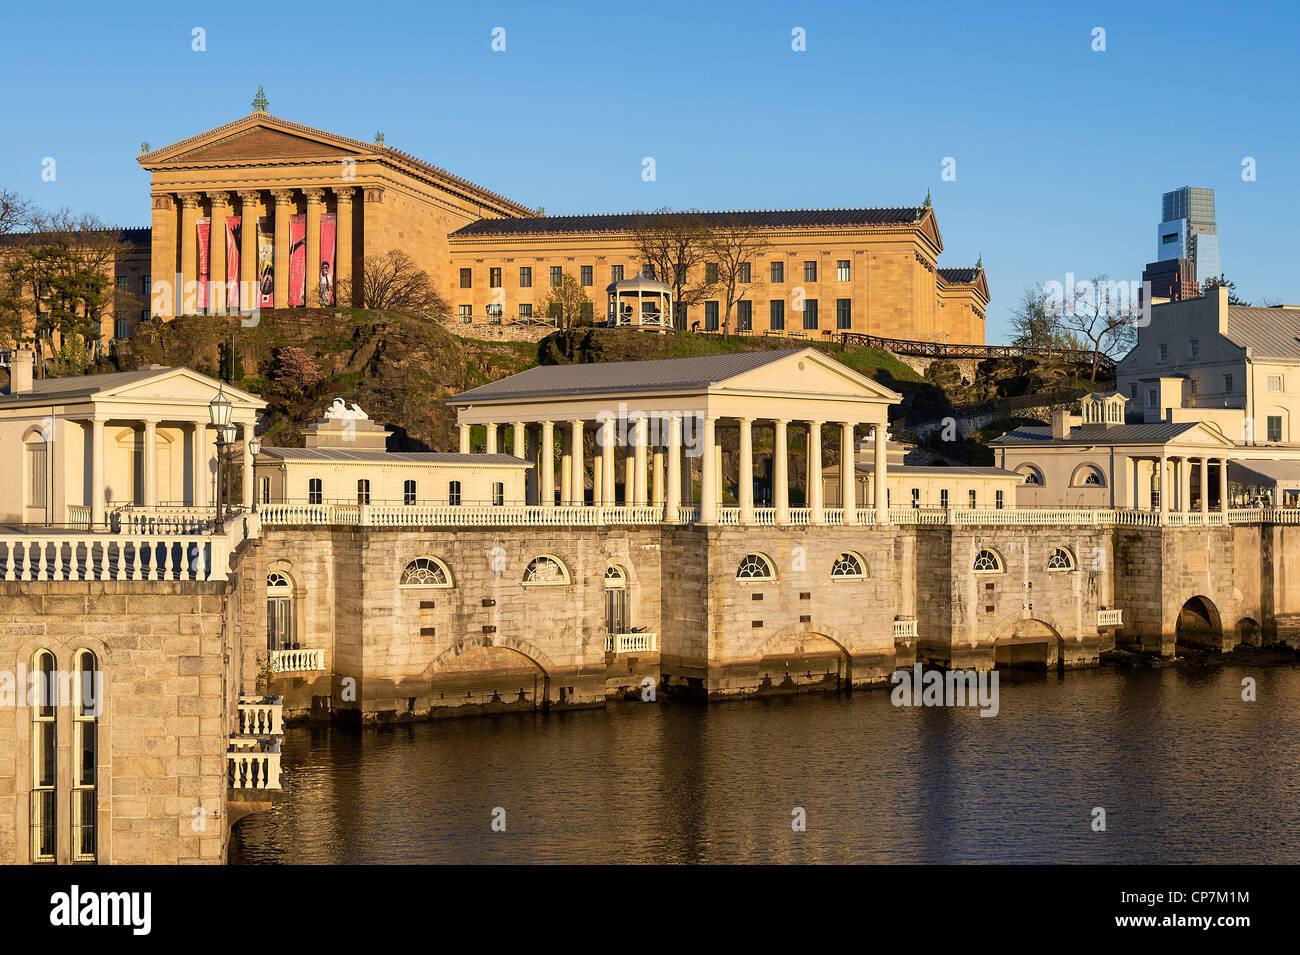 The Fairmount Water Works and art museum, Philadelphia, Pa, Pennsylvania, USA - Stock Image